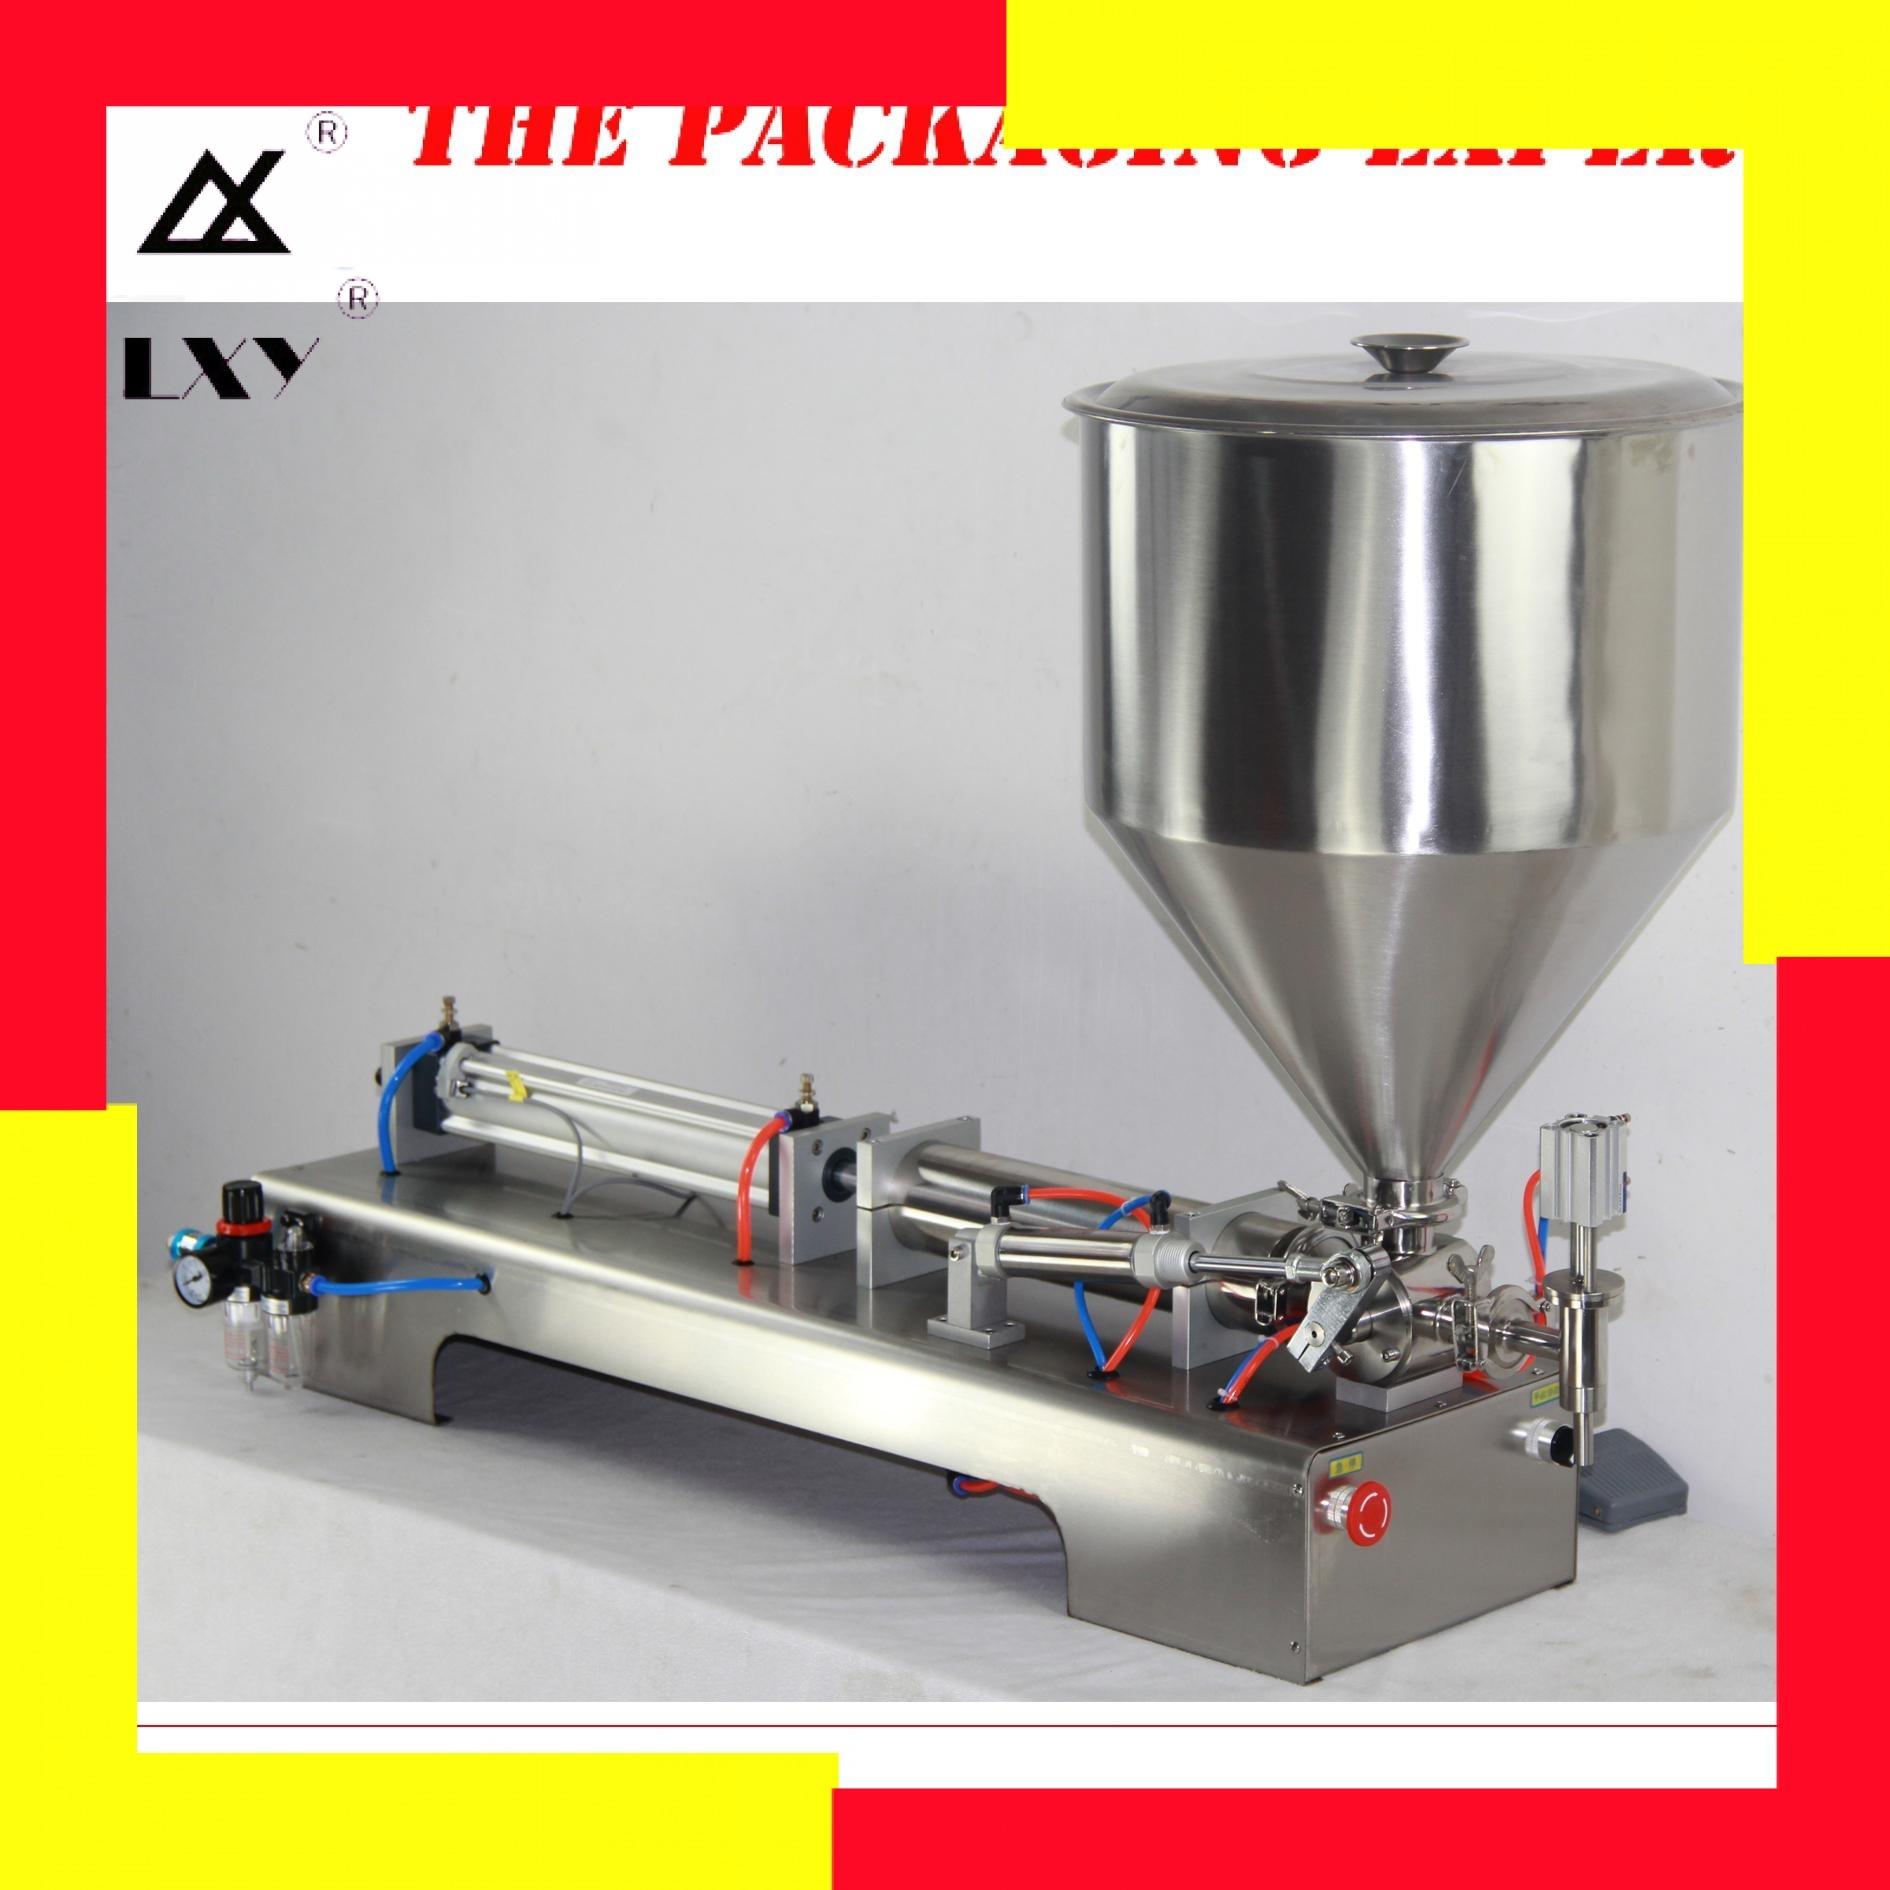 1000-5000ml Paste Filling Machine Nial Polish Shampoo Lotion Cream Yoghourt Honey Juice Sauce Jam Gel Pneumatic Piston